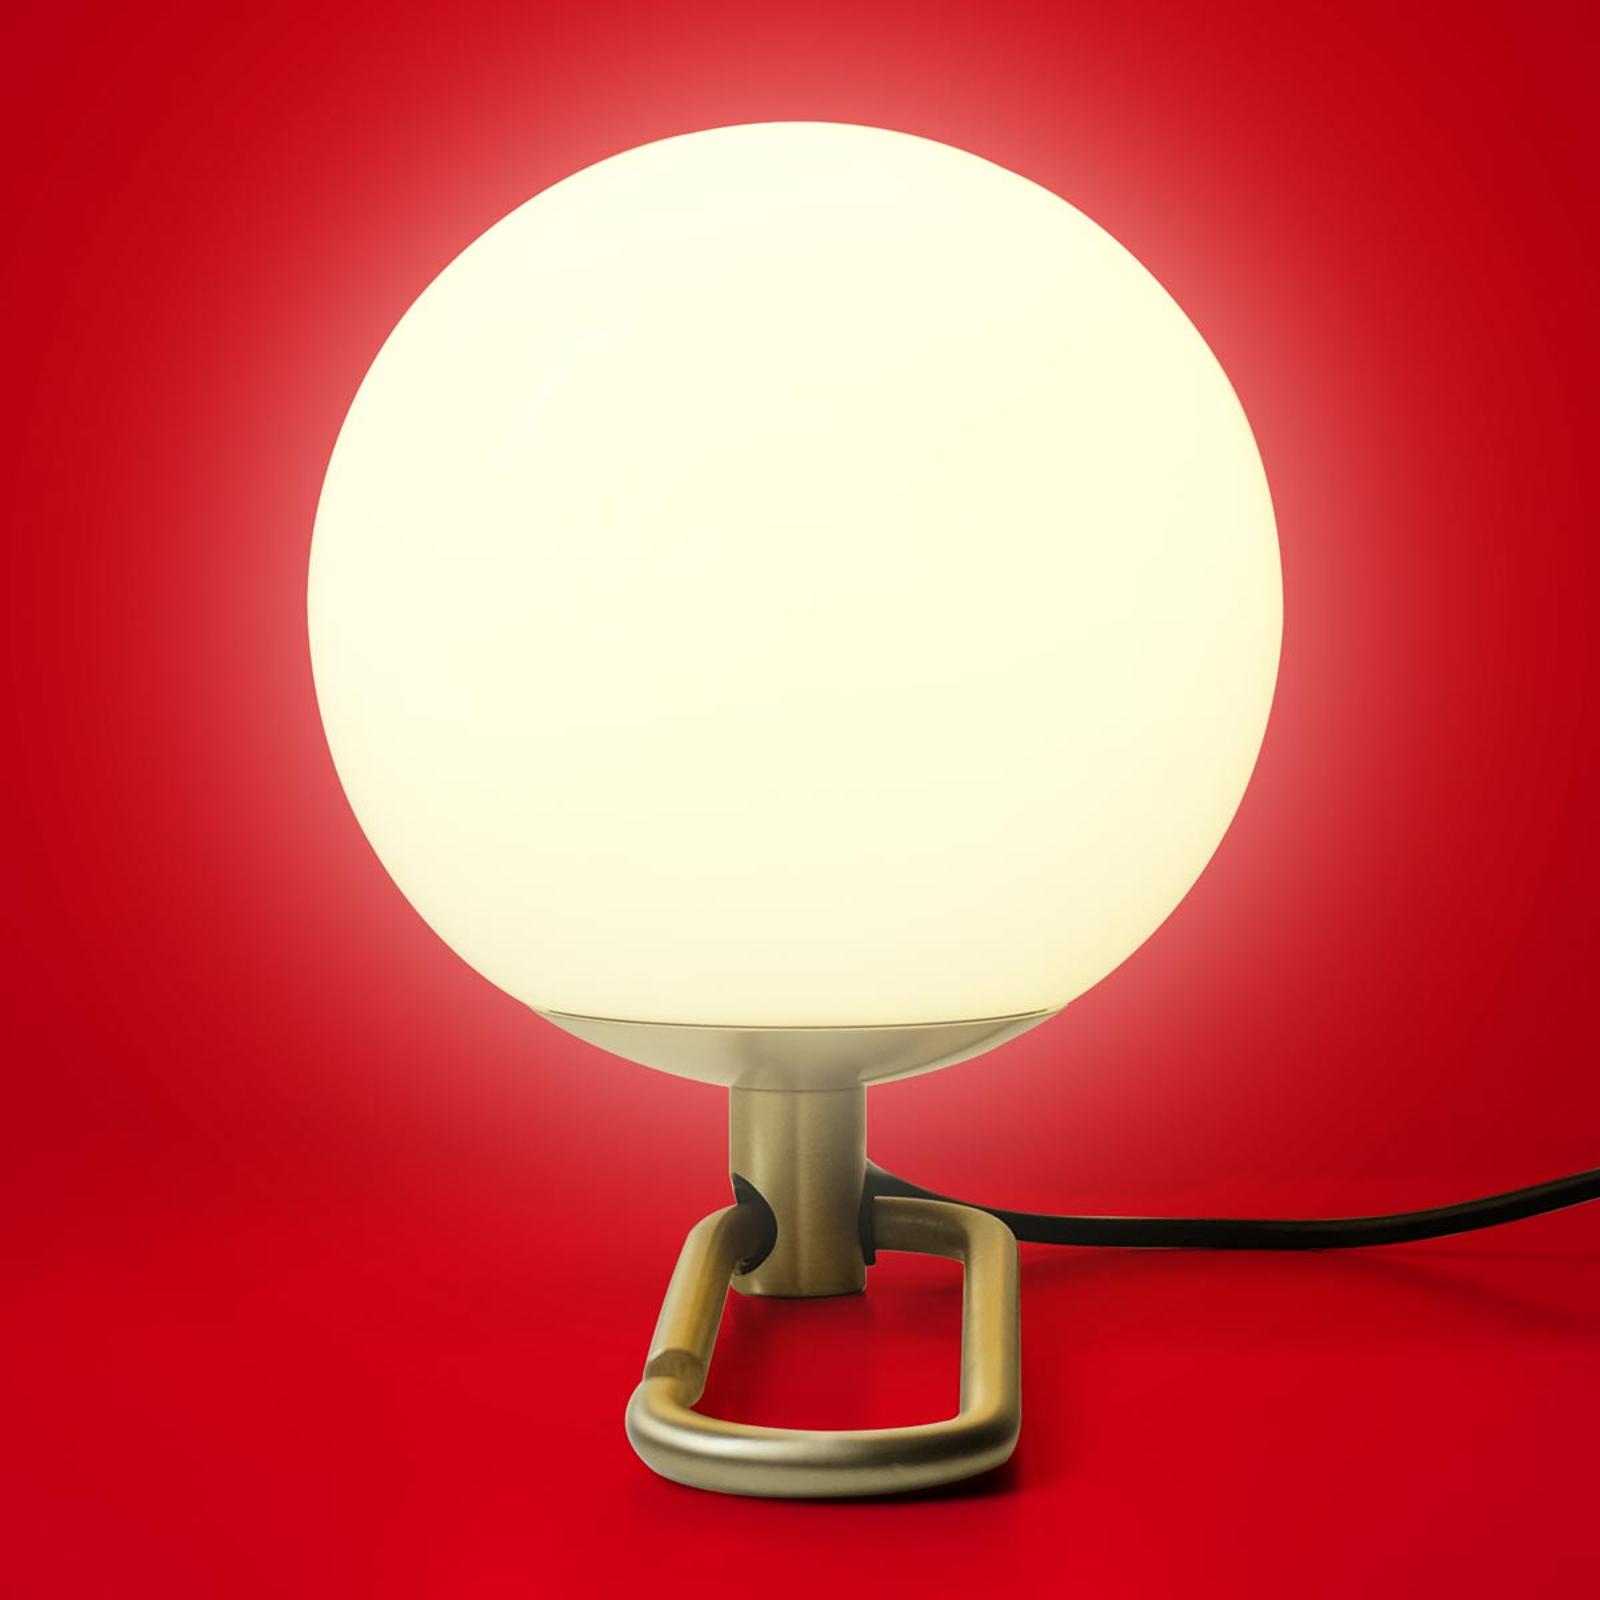 Wszechstronna lampa stołowa LED nh1217